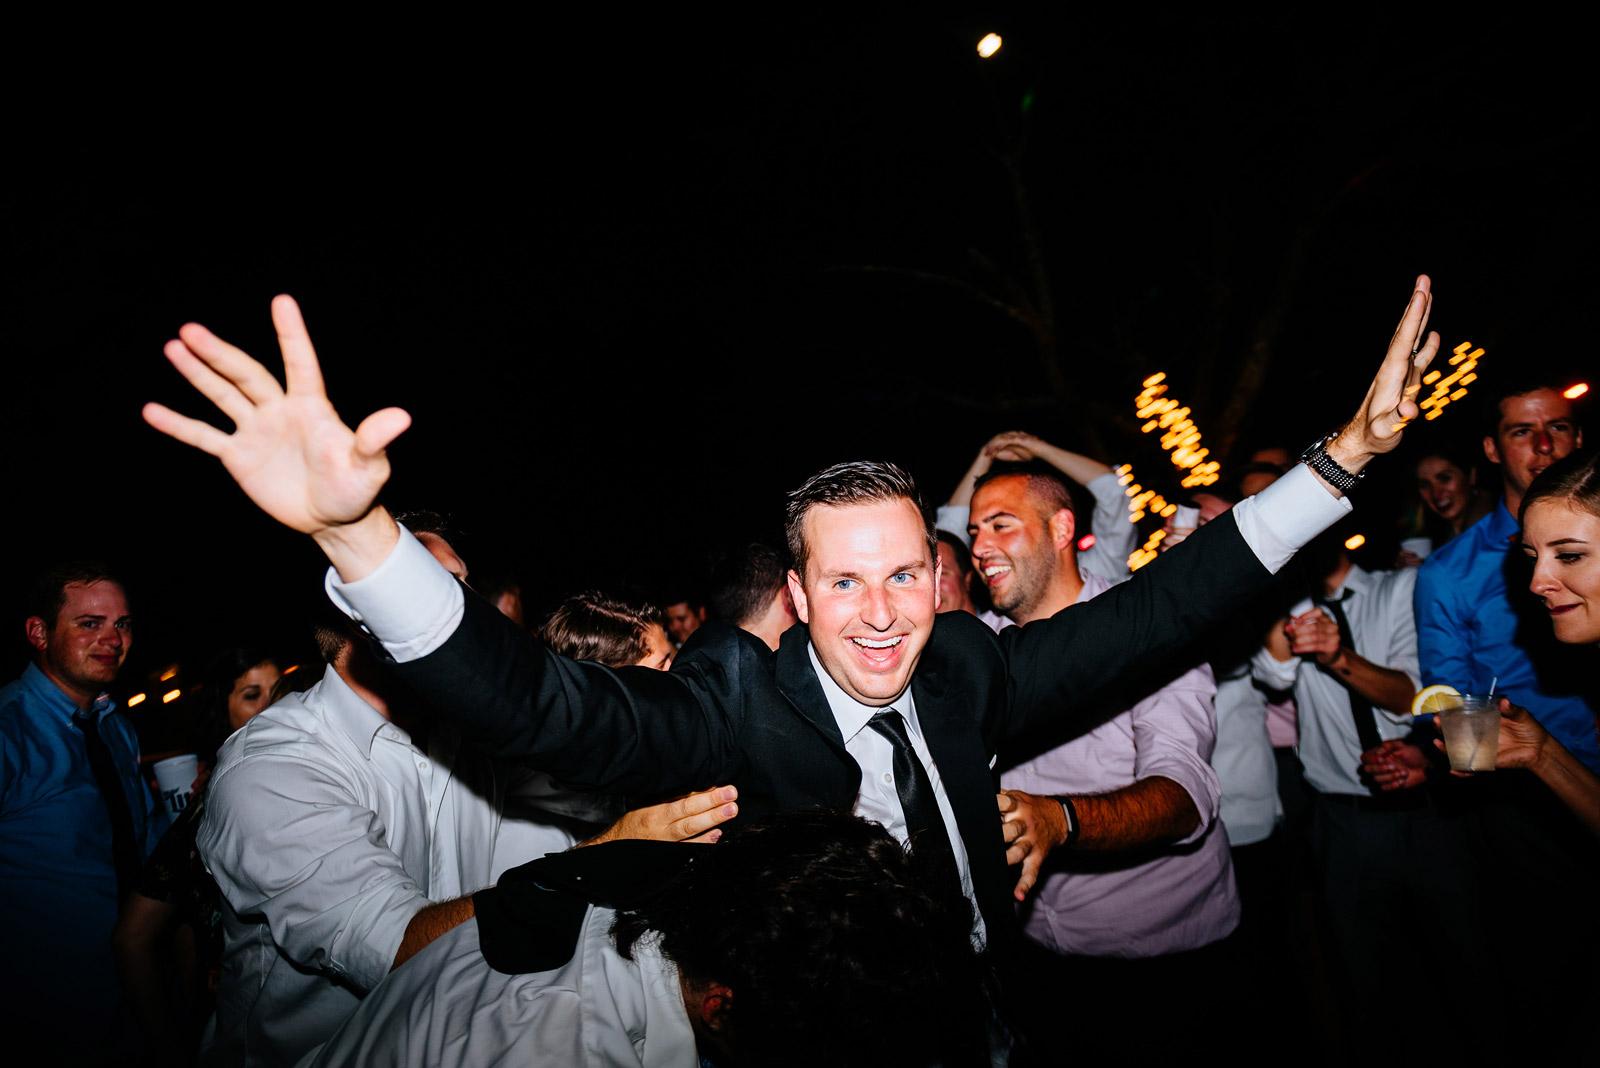 happy groom during wedding reception